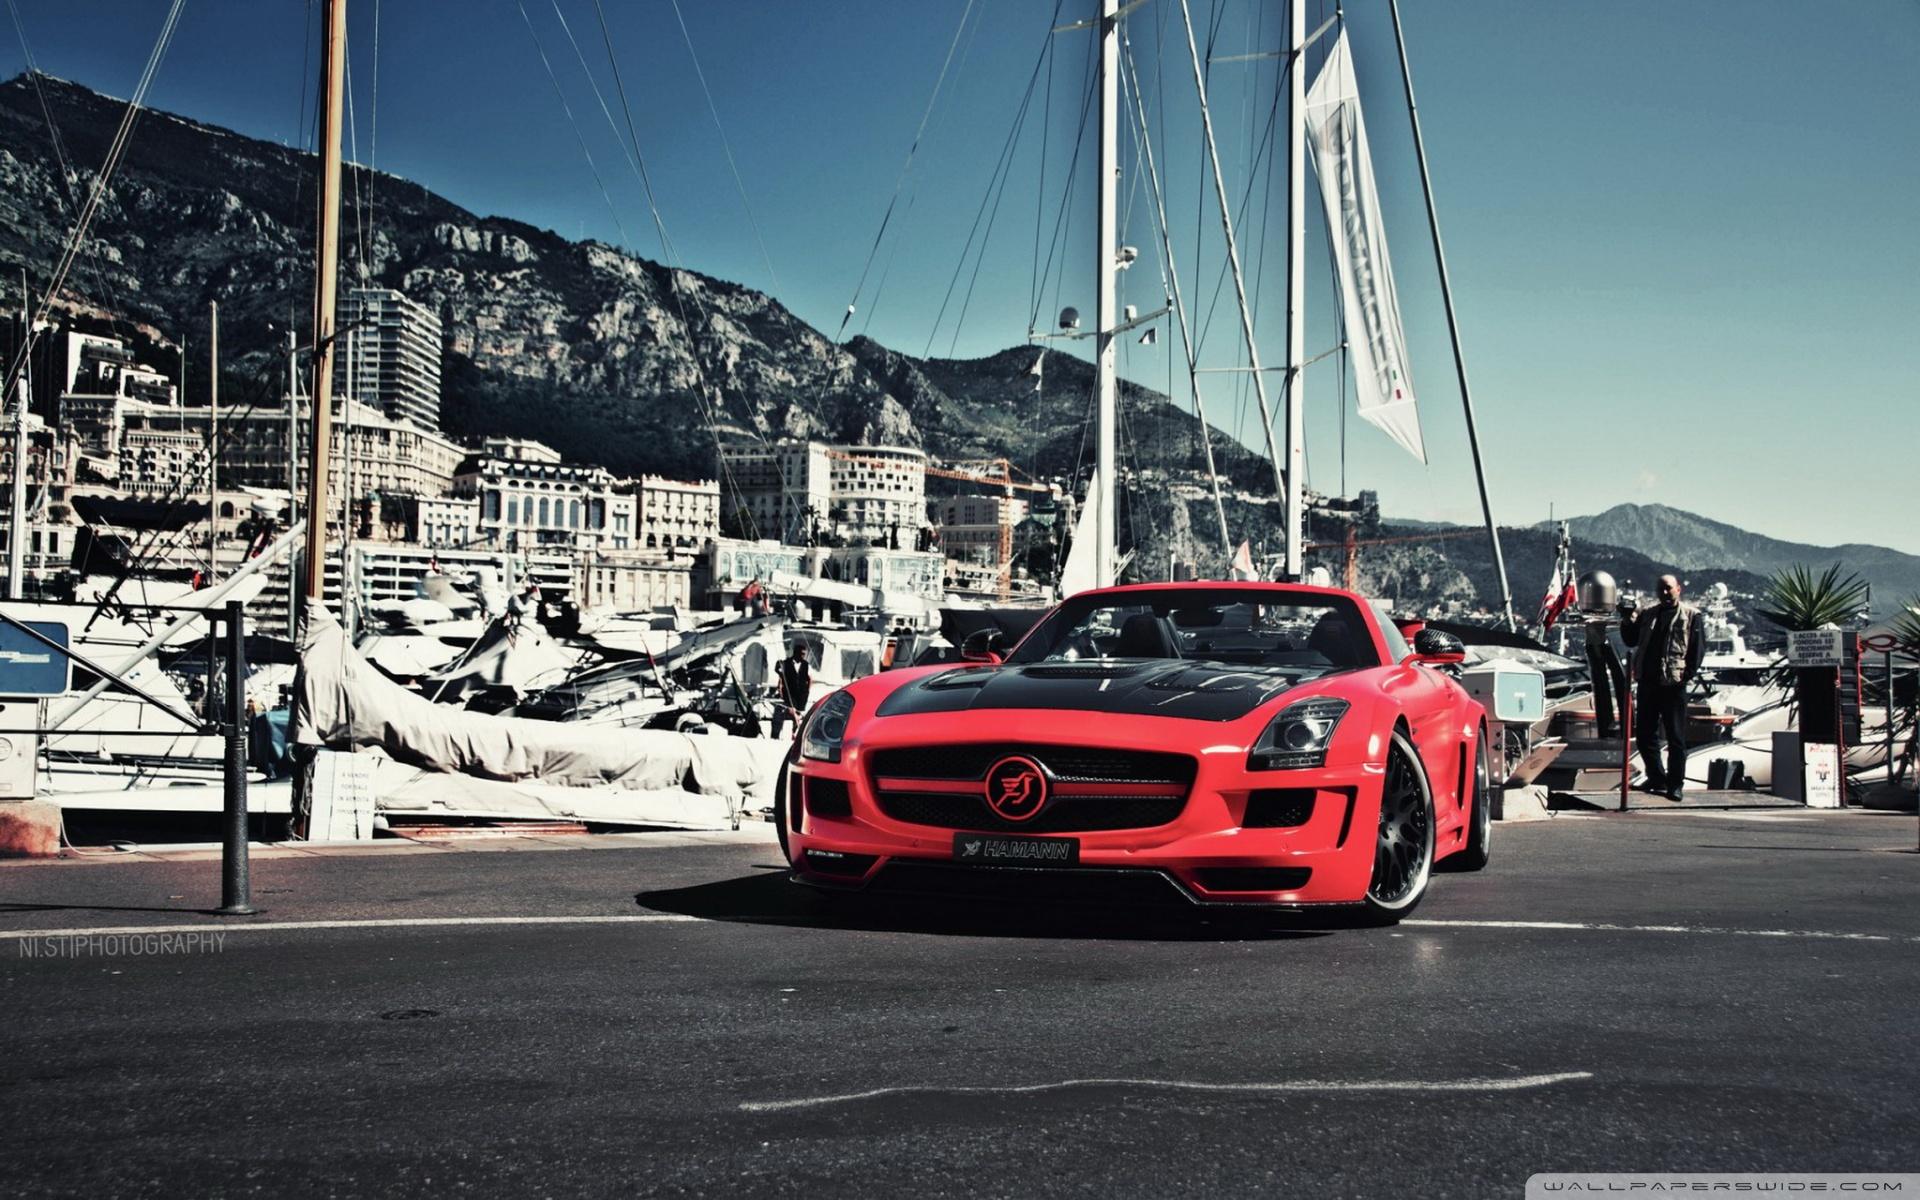 Mercedes Benz Sls Amg Hd Wallpaper Background Image 1920x1200